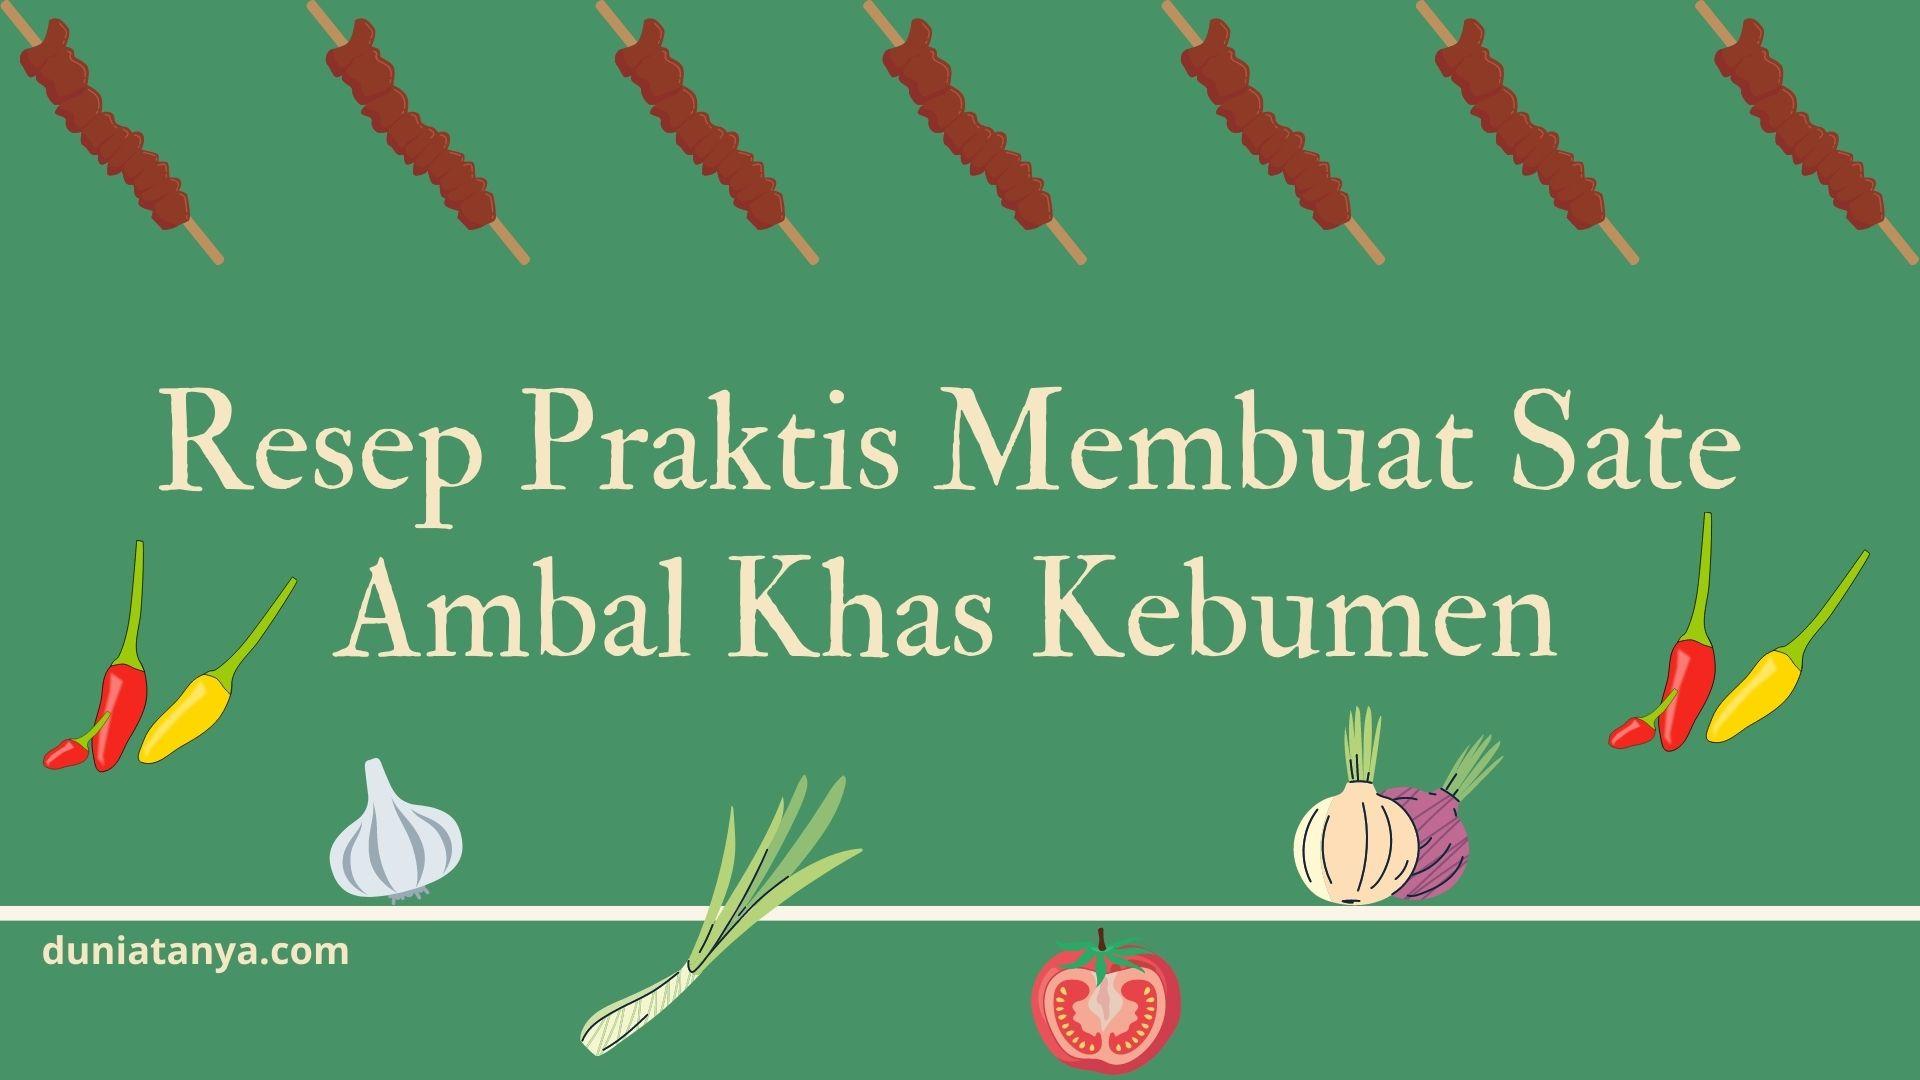 Read more about the article Resep Praktis Membuat Sate Ambal Khas Kebumen